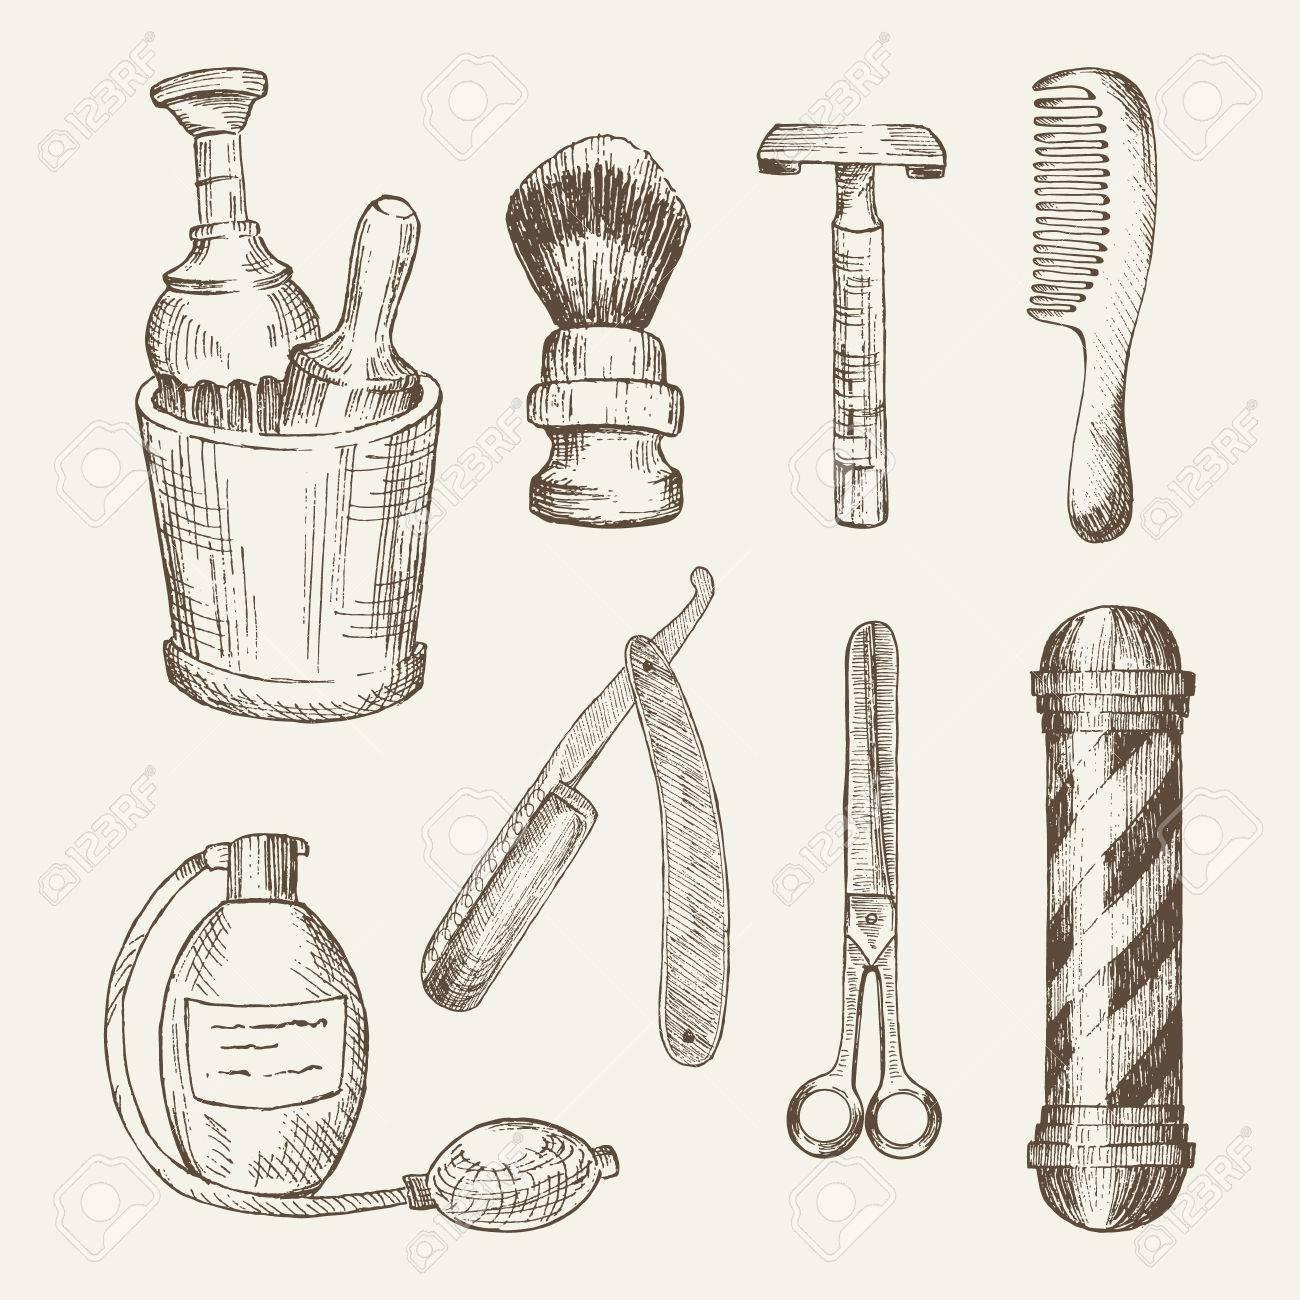 Retro Illustrations Of Barber Shop Elements Cup Brush Razor